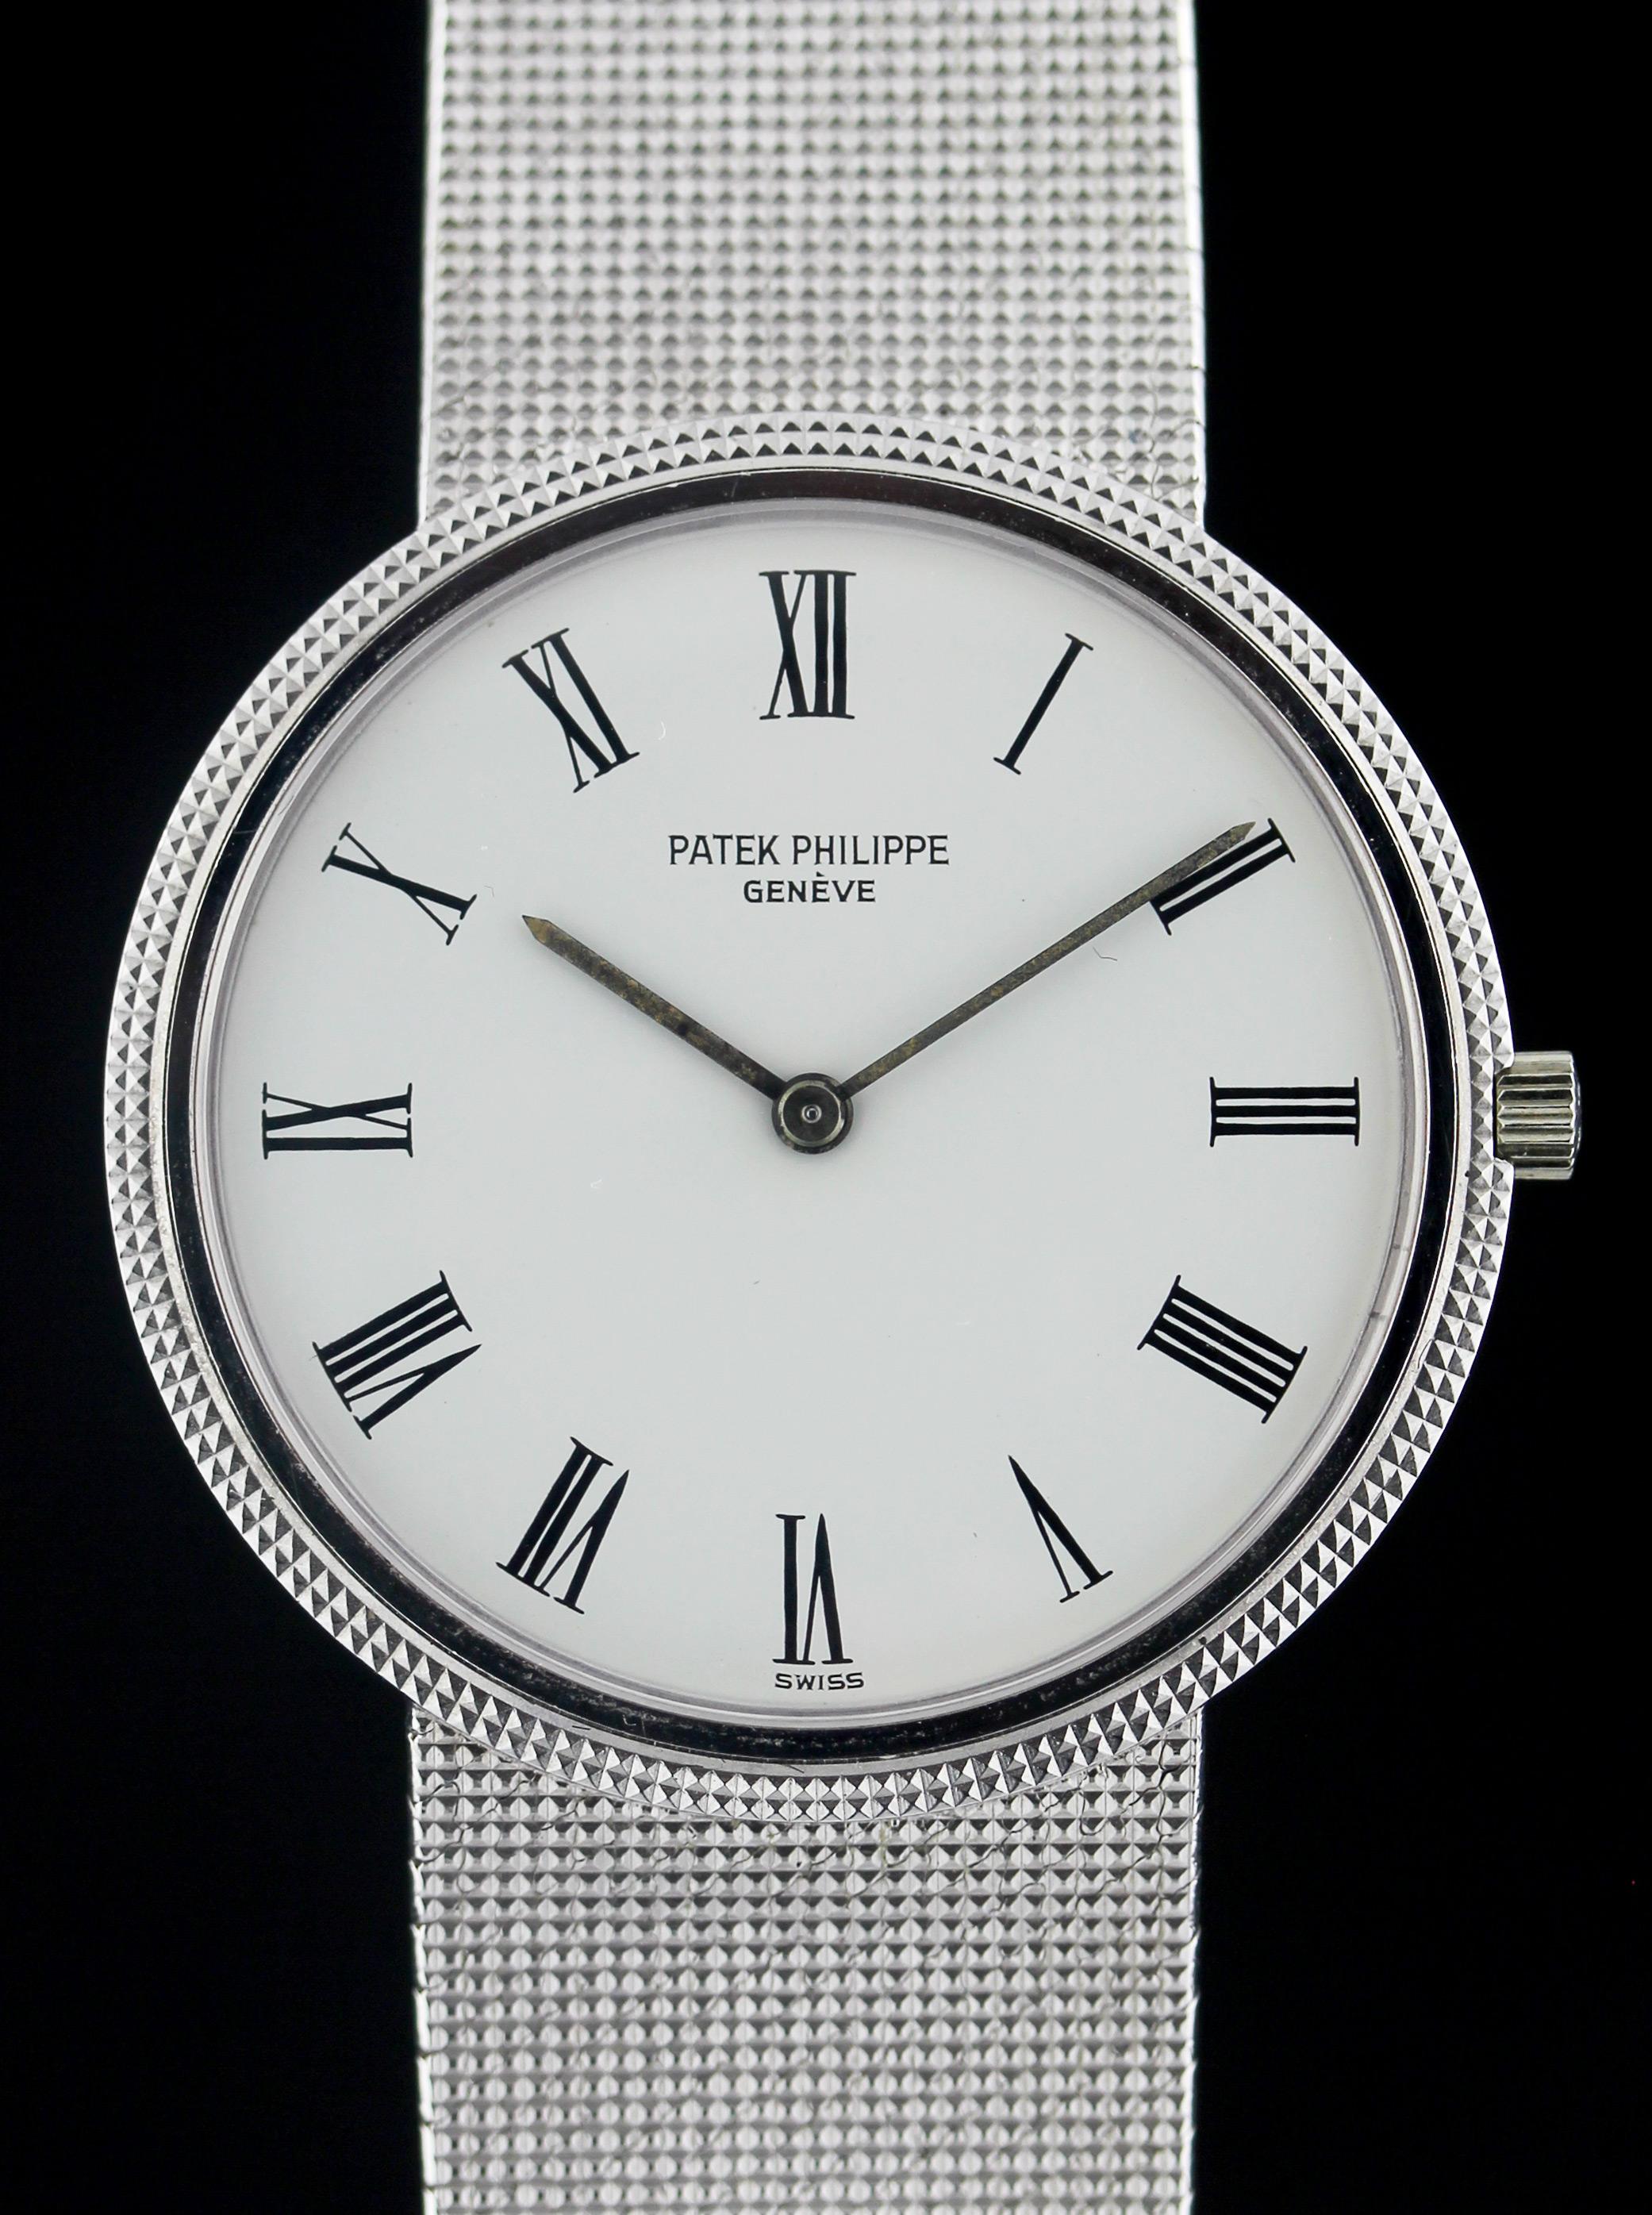 Patek Philippe Calatrava in white gold, ref. 3520